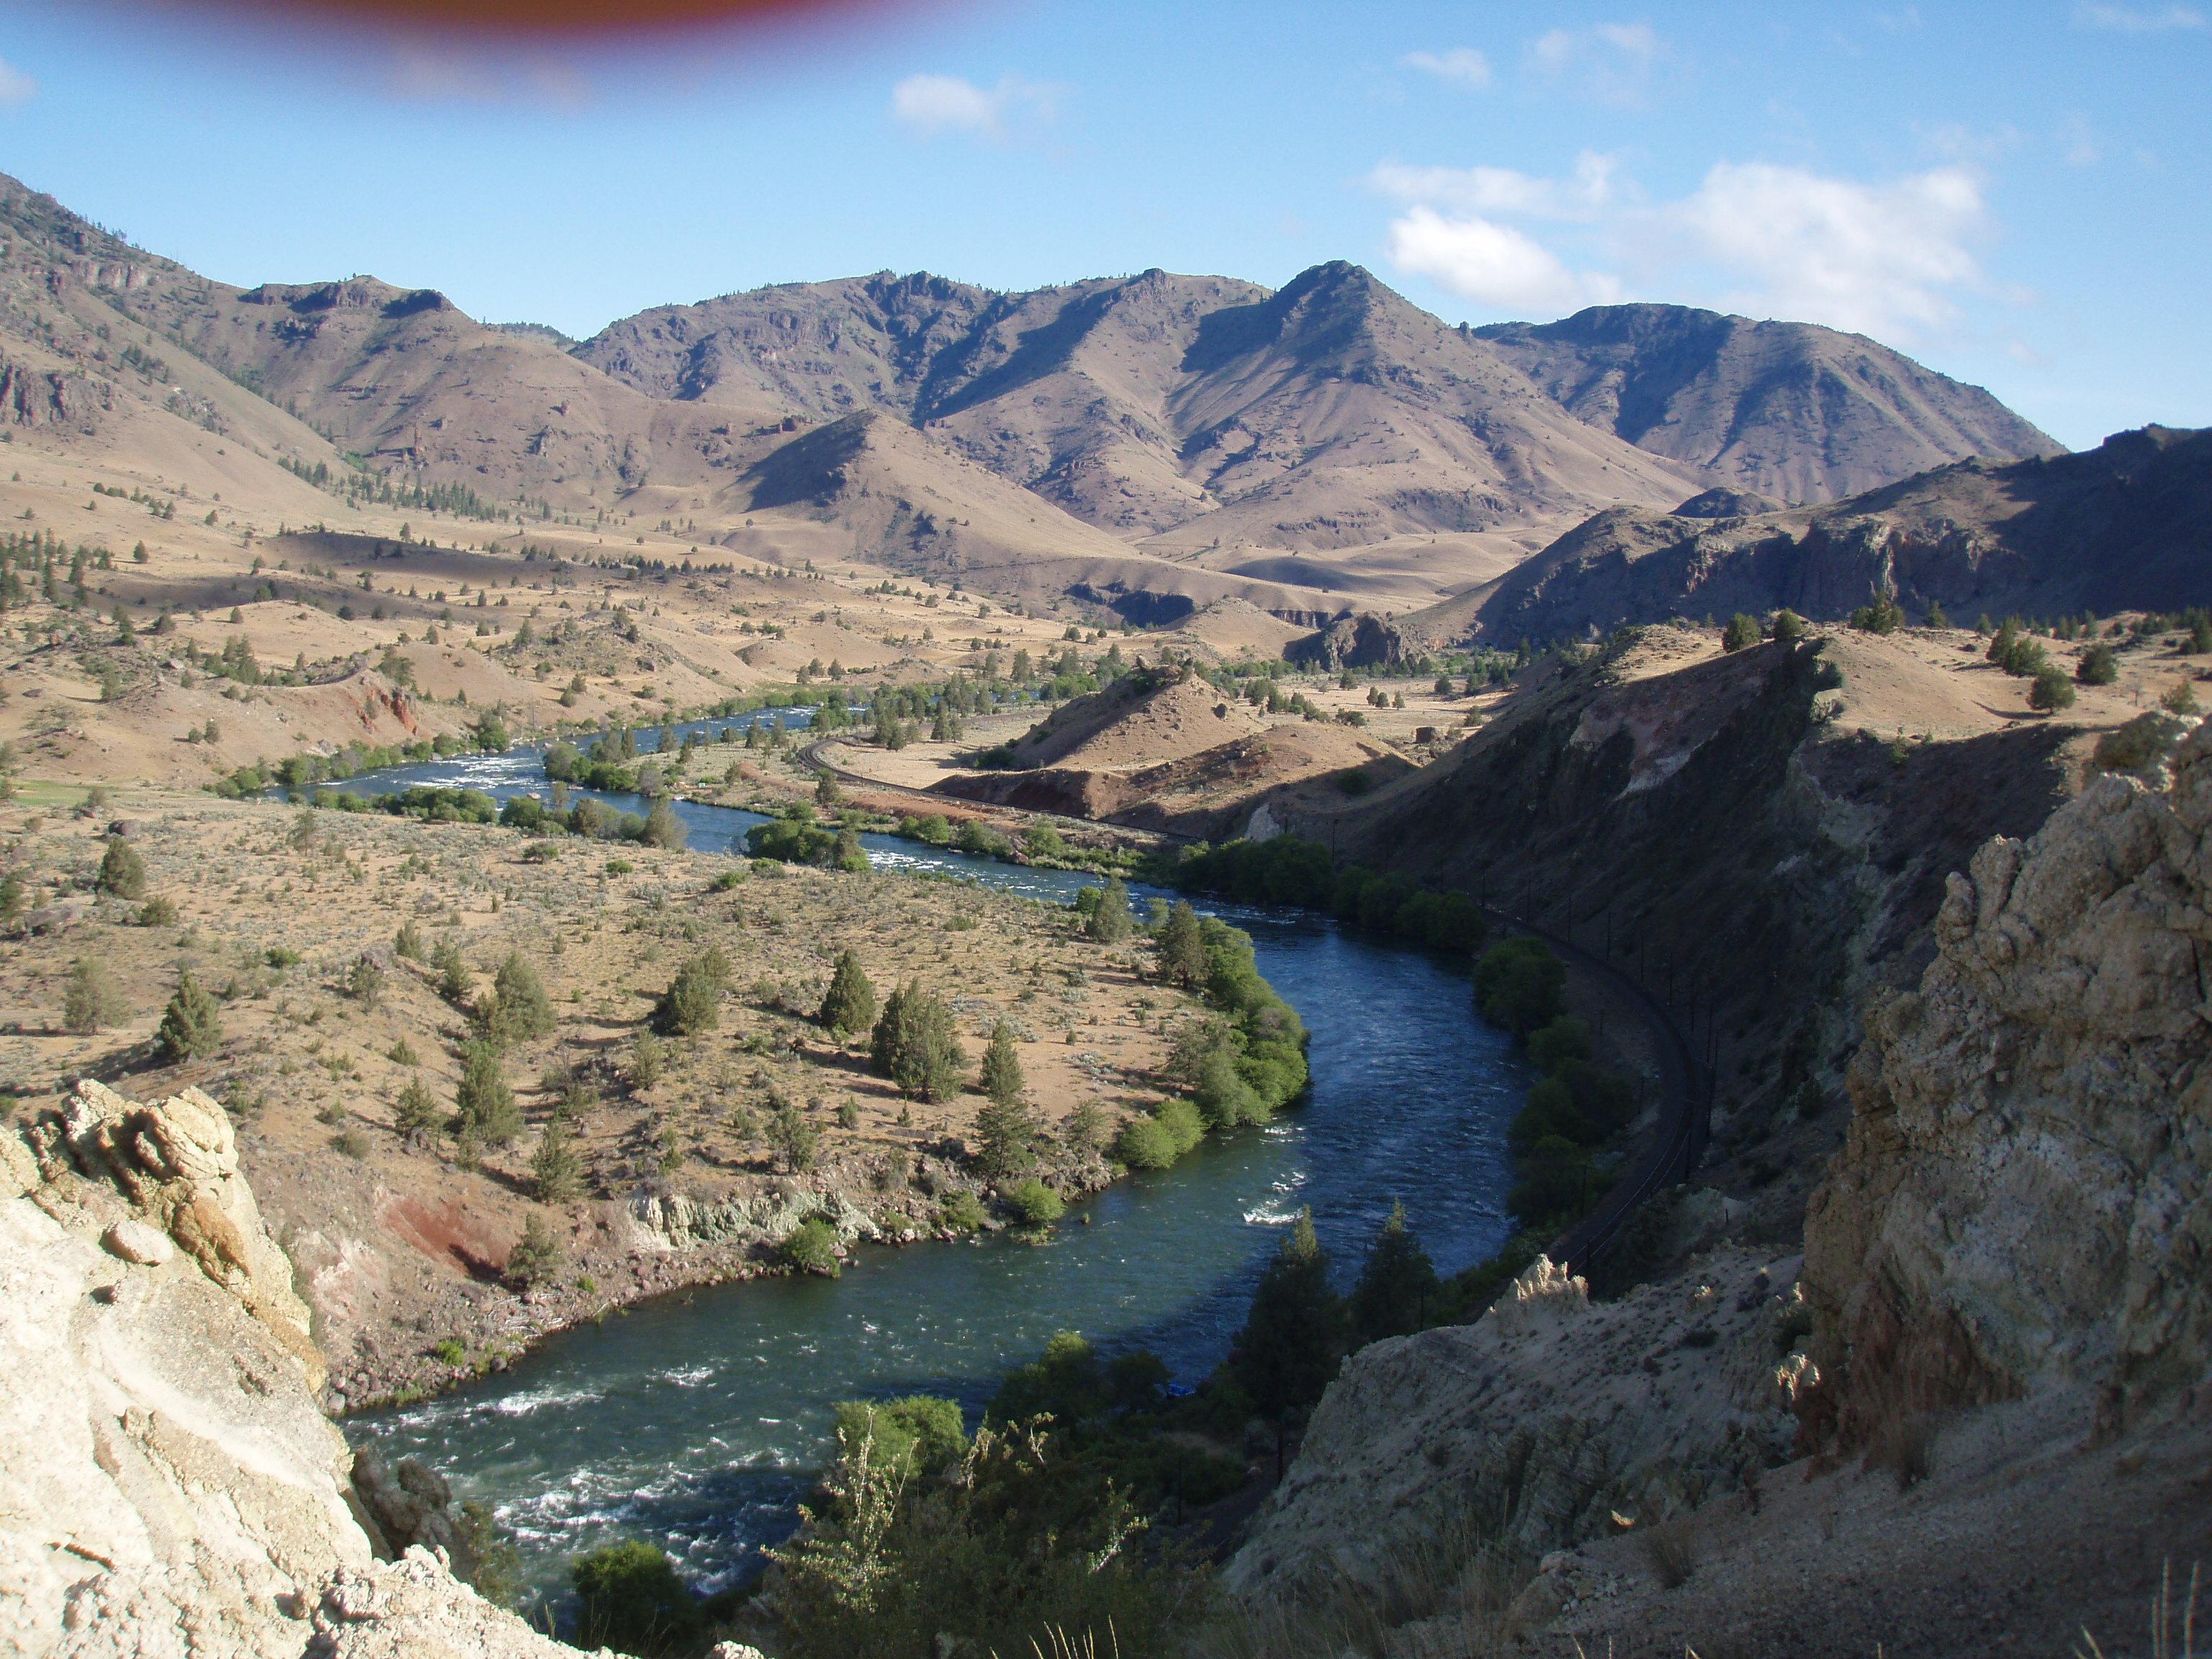 Rafting for Deschutes River Redsides - Dennis Dauble